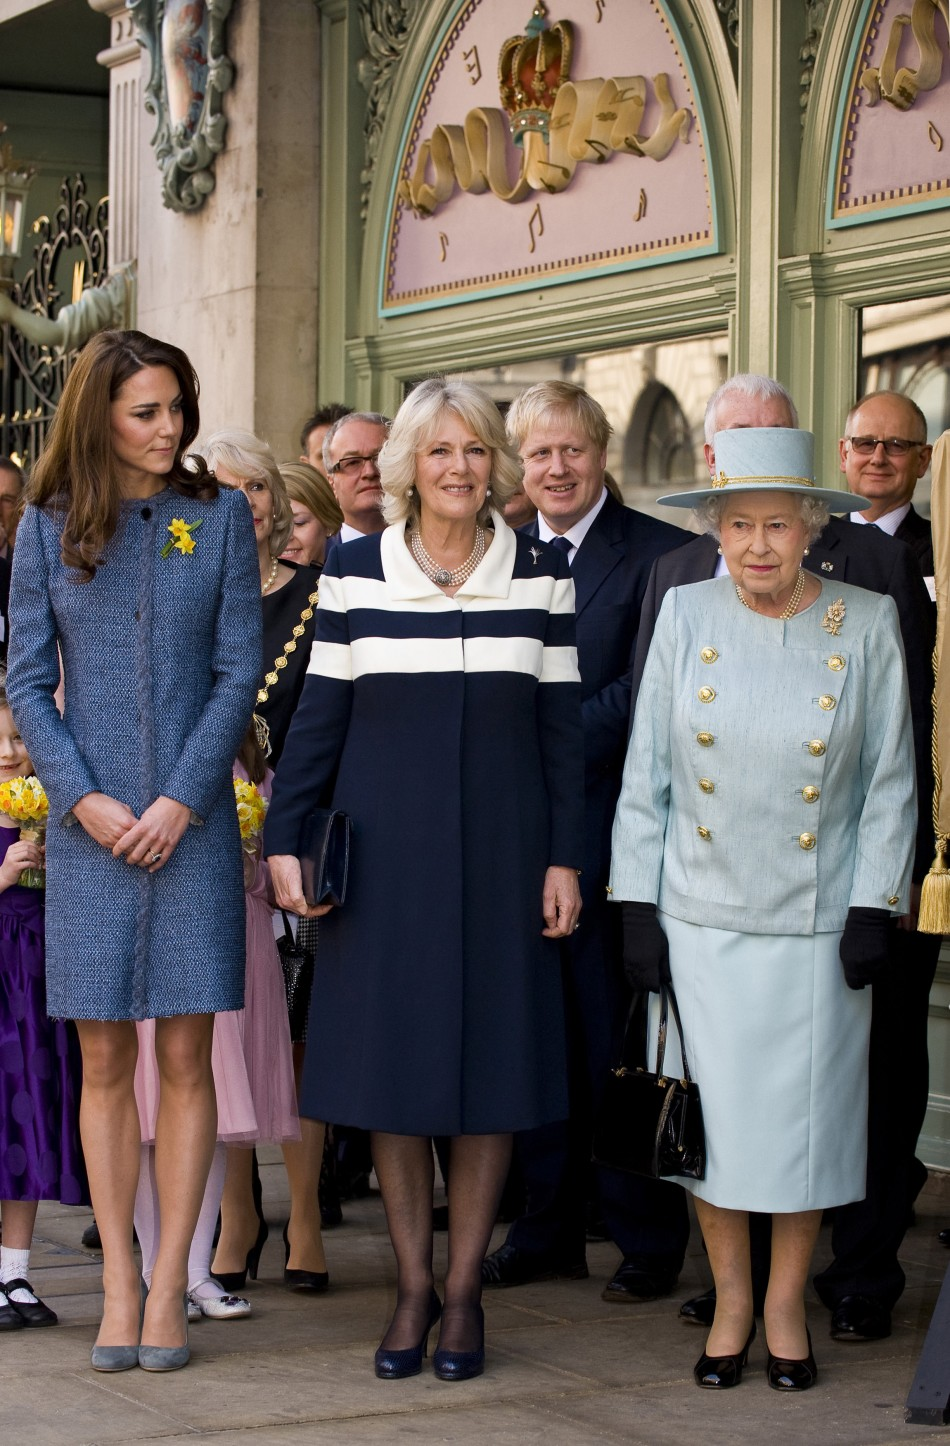 Queen Grants Camilla Highest Female Rank in Royal Victorian Order